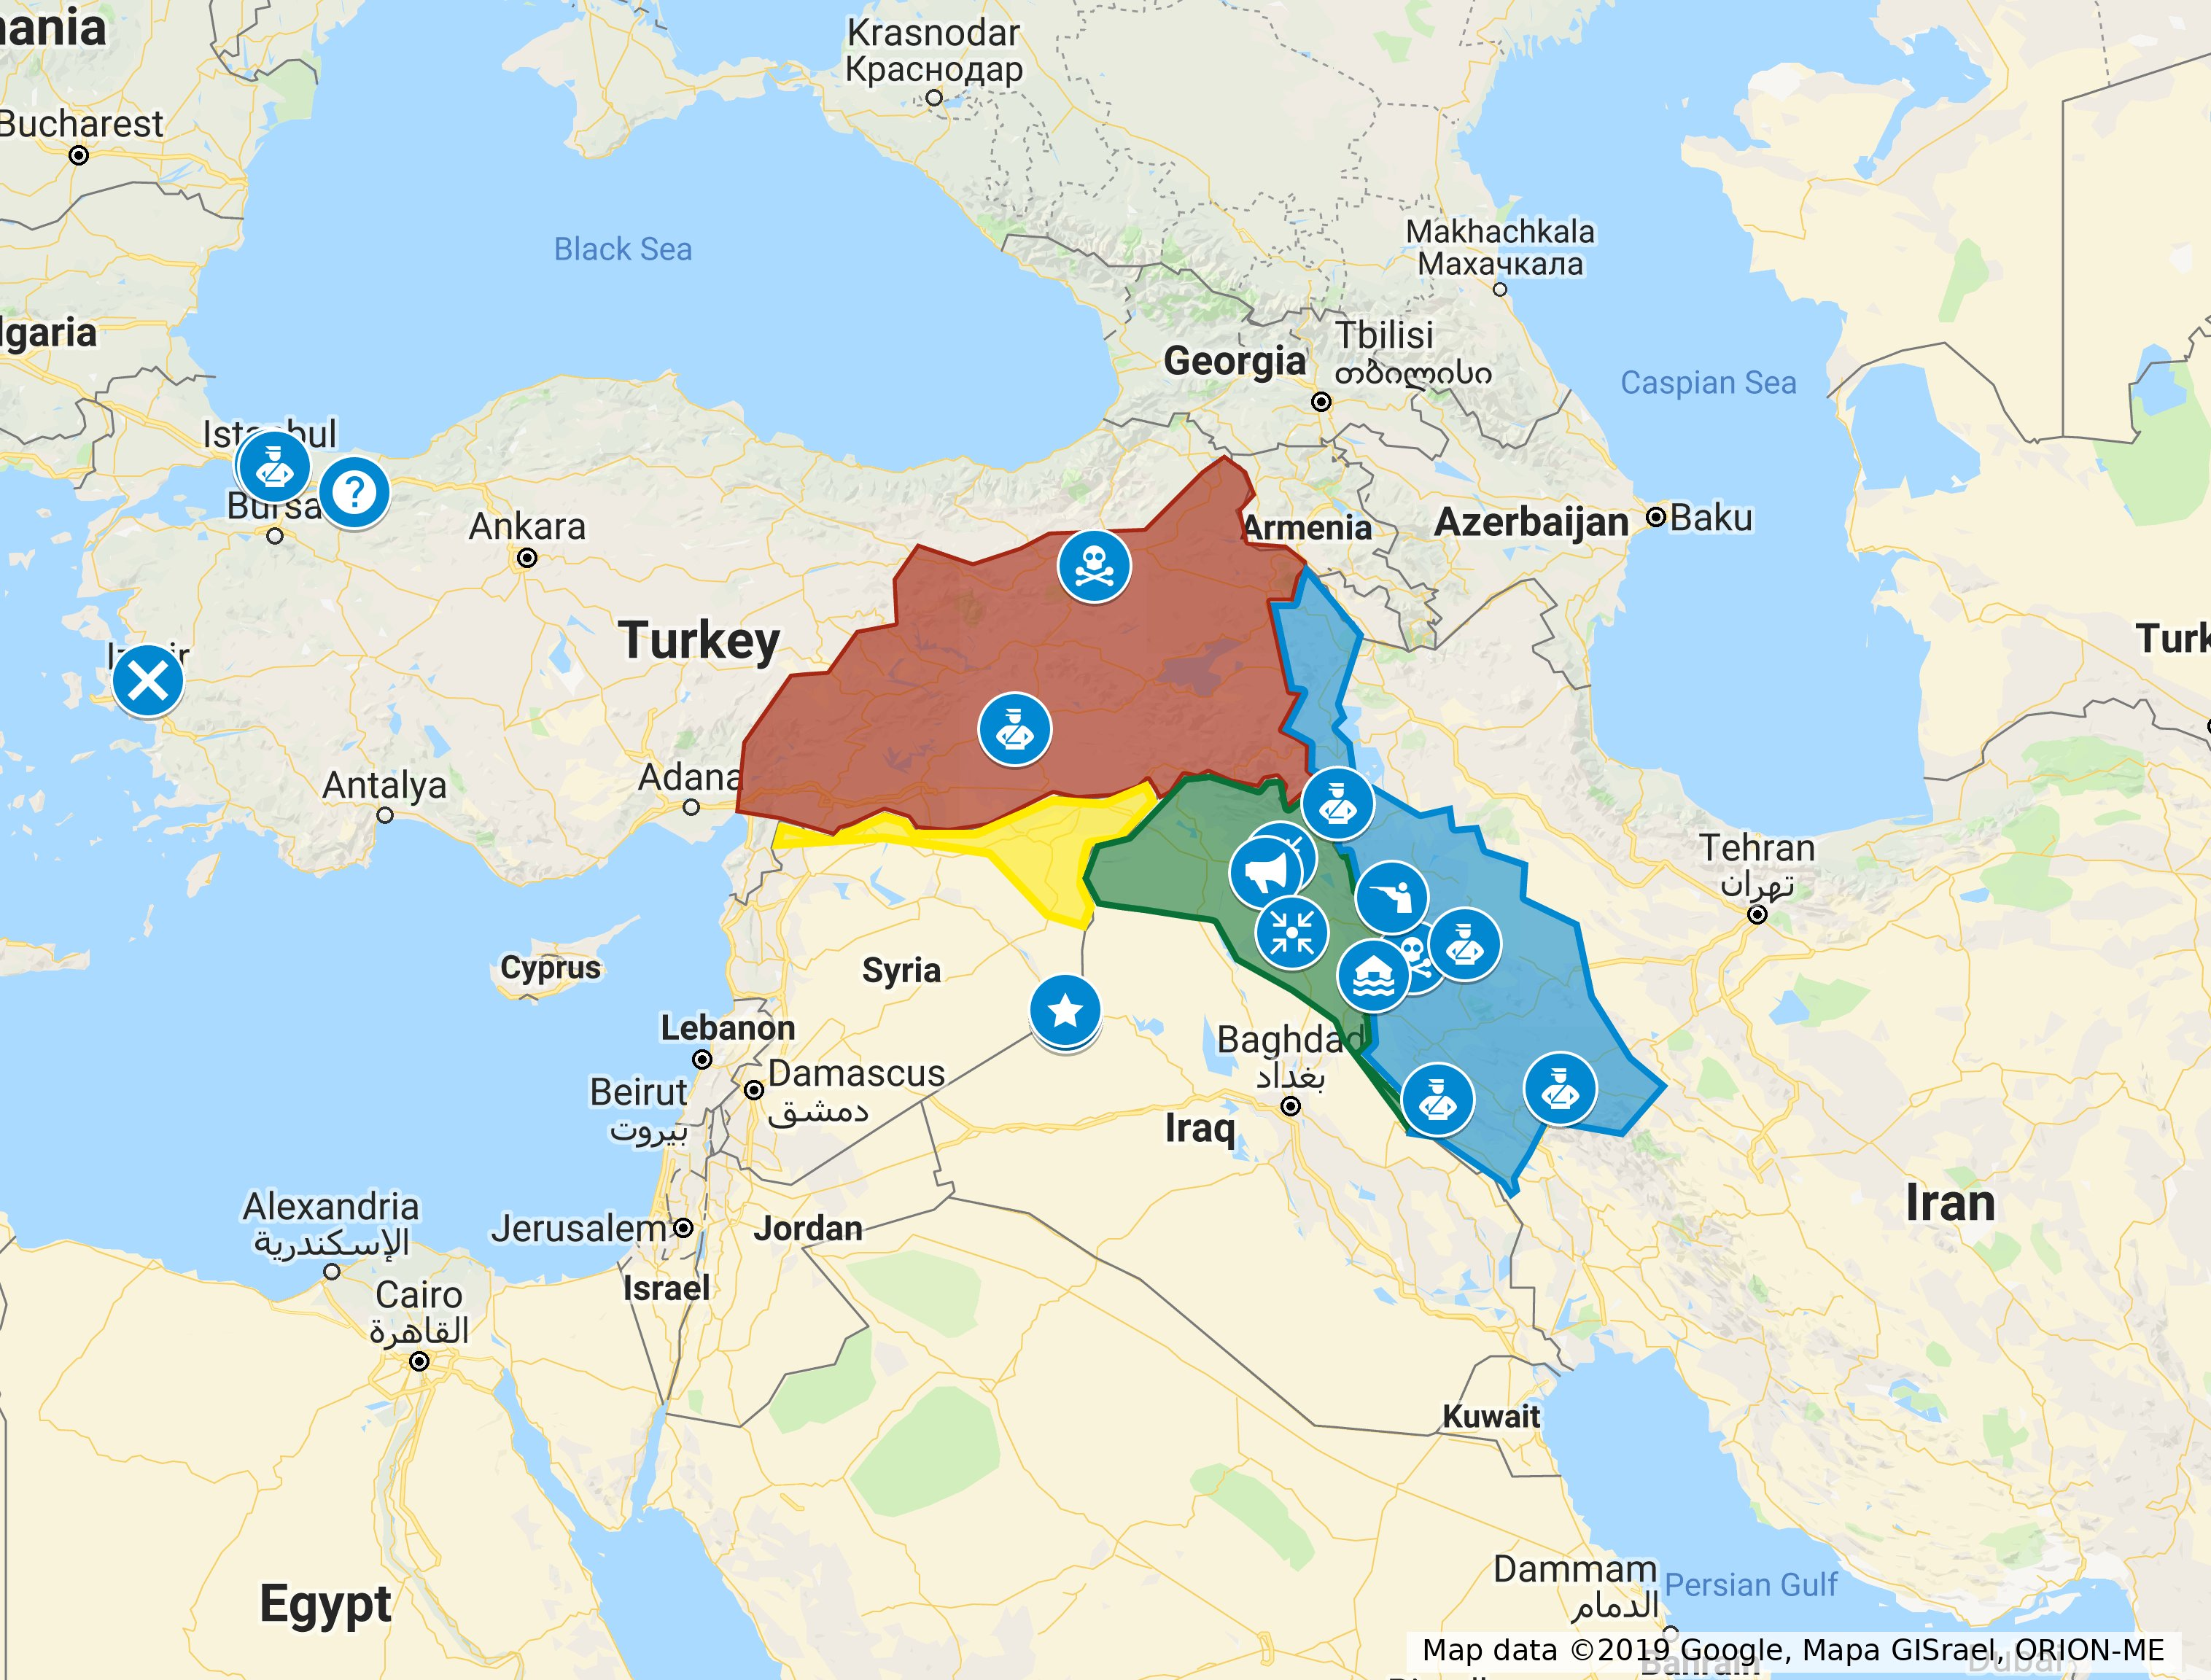 Kurdistan Map on dead sea map, chechnya map, kashmir map, erbil map, kyrgyzstan map, baluchistan map, lebanon map, iraqi kurdistan, uzbekistan map, assyria map, kurdish population map, kurdish language, ukraine map, kurdish jews, turkish kurdistan, iraq map, afghanistan map, iranian kurdistan, halabja poison gas attack, kurdistan province, kurdish people, turkey map, kuwait map, baghdad map, kurdish flag, south ossetia map, palestine map, zagros mountains, persian people, iran map, scotland map,